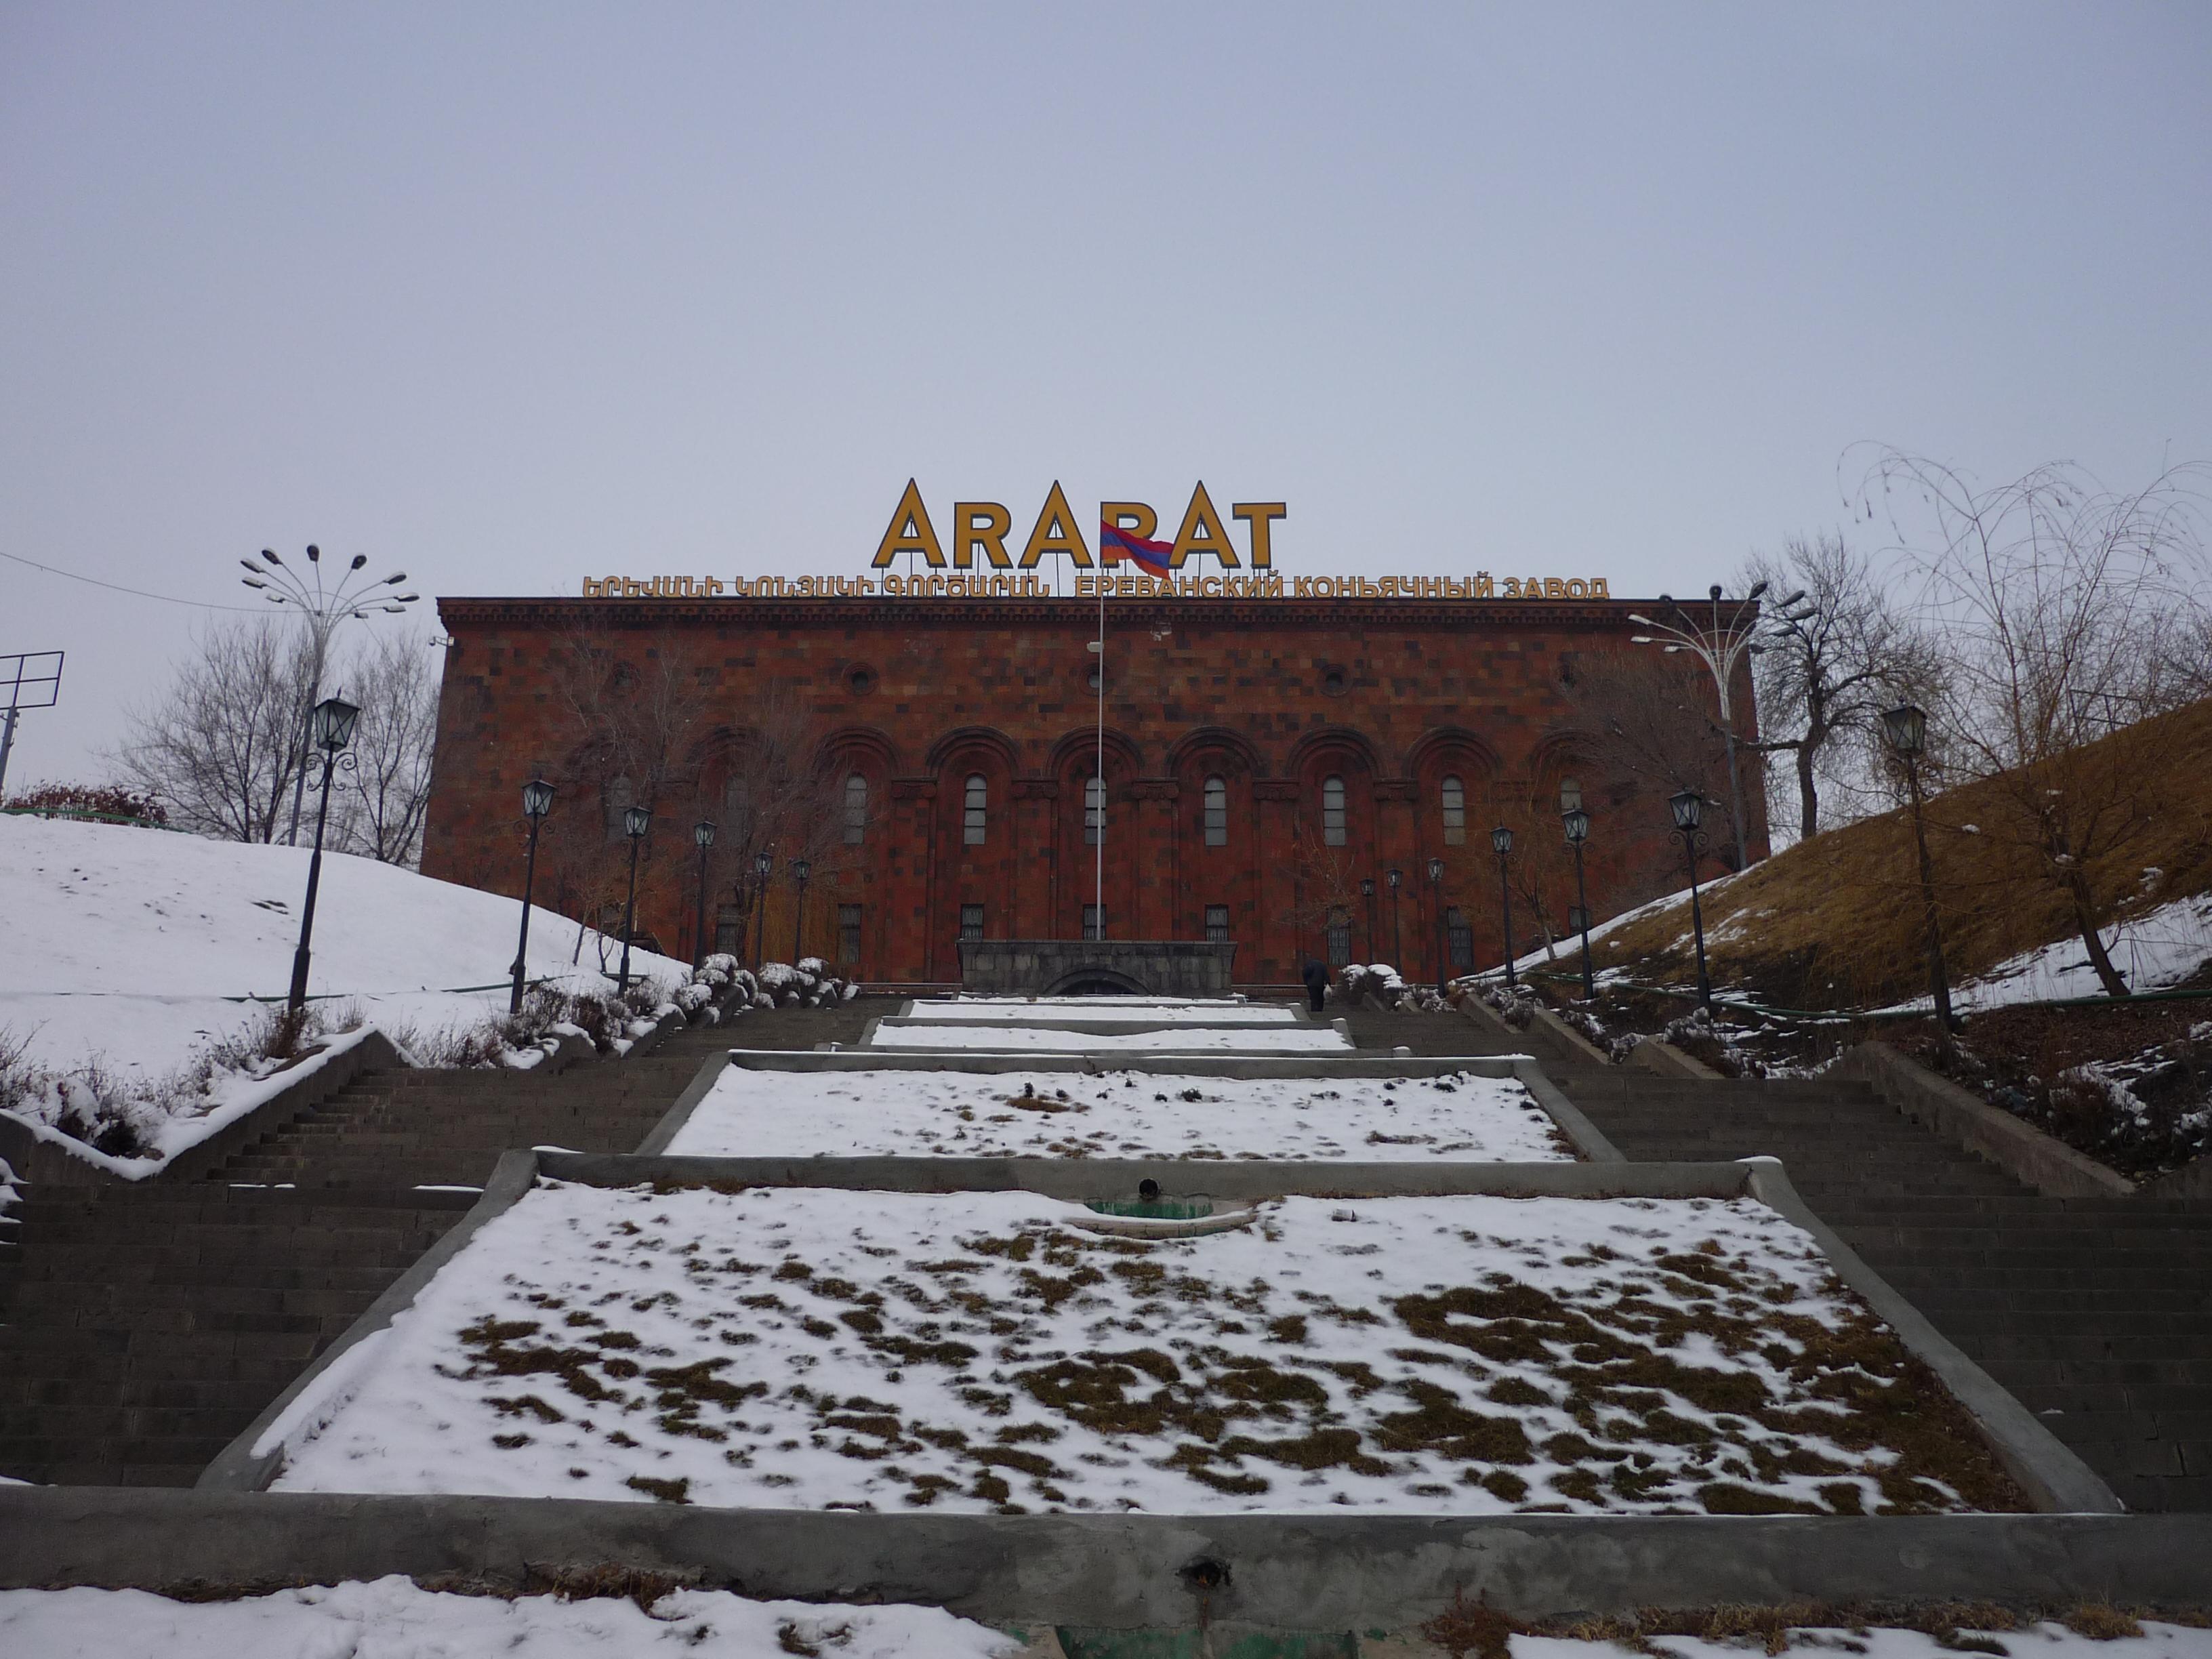 Haghtanak Bridge and Ararat Brandy Company | weepingredorger